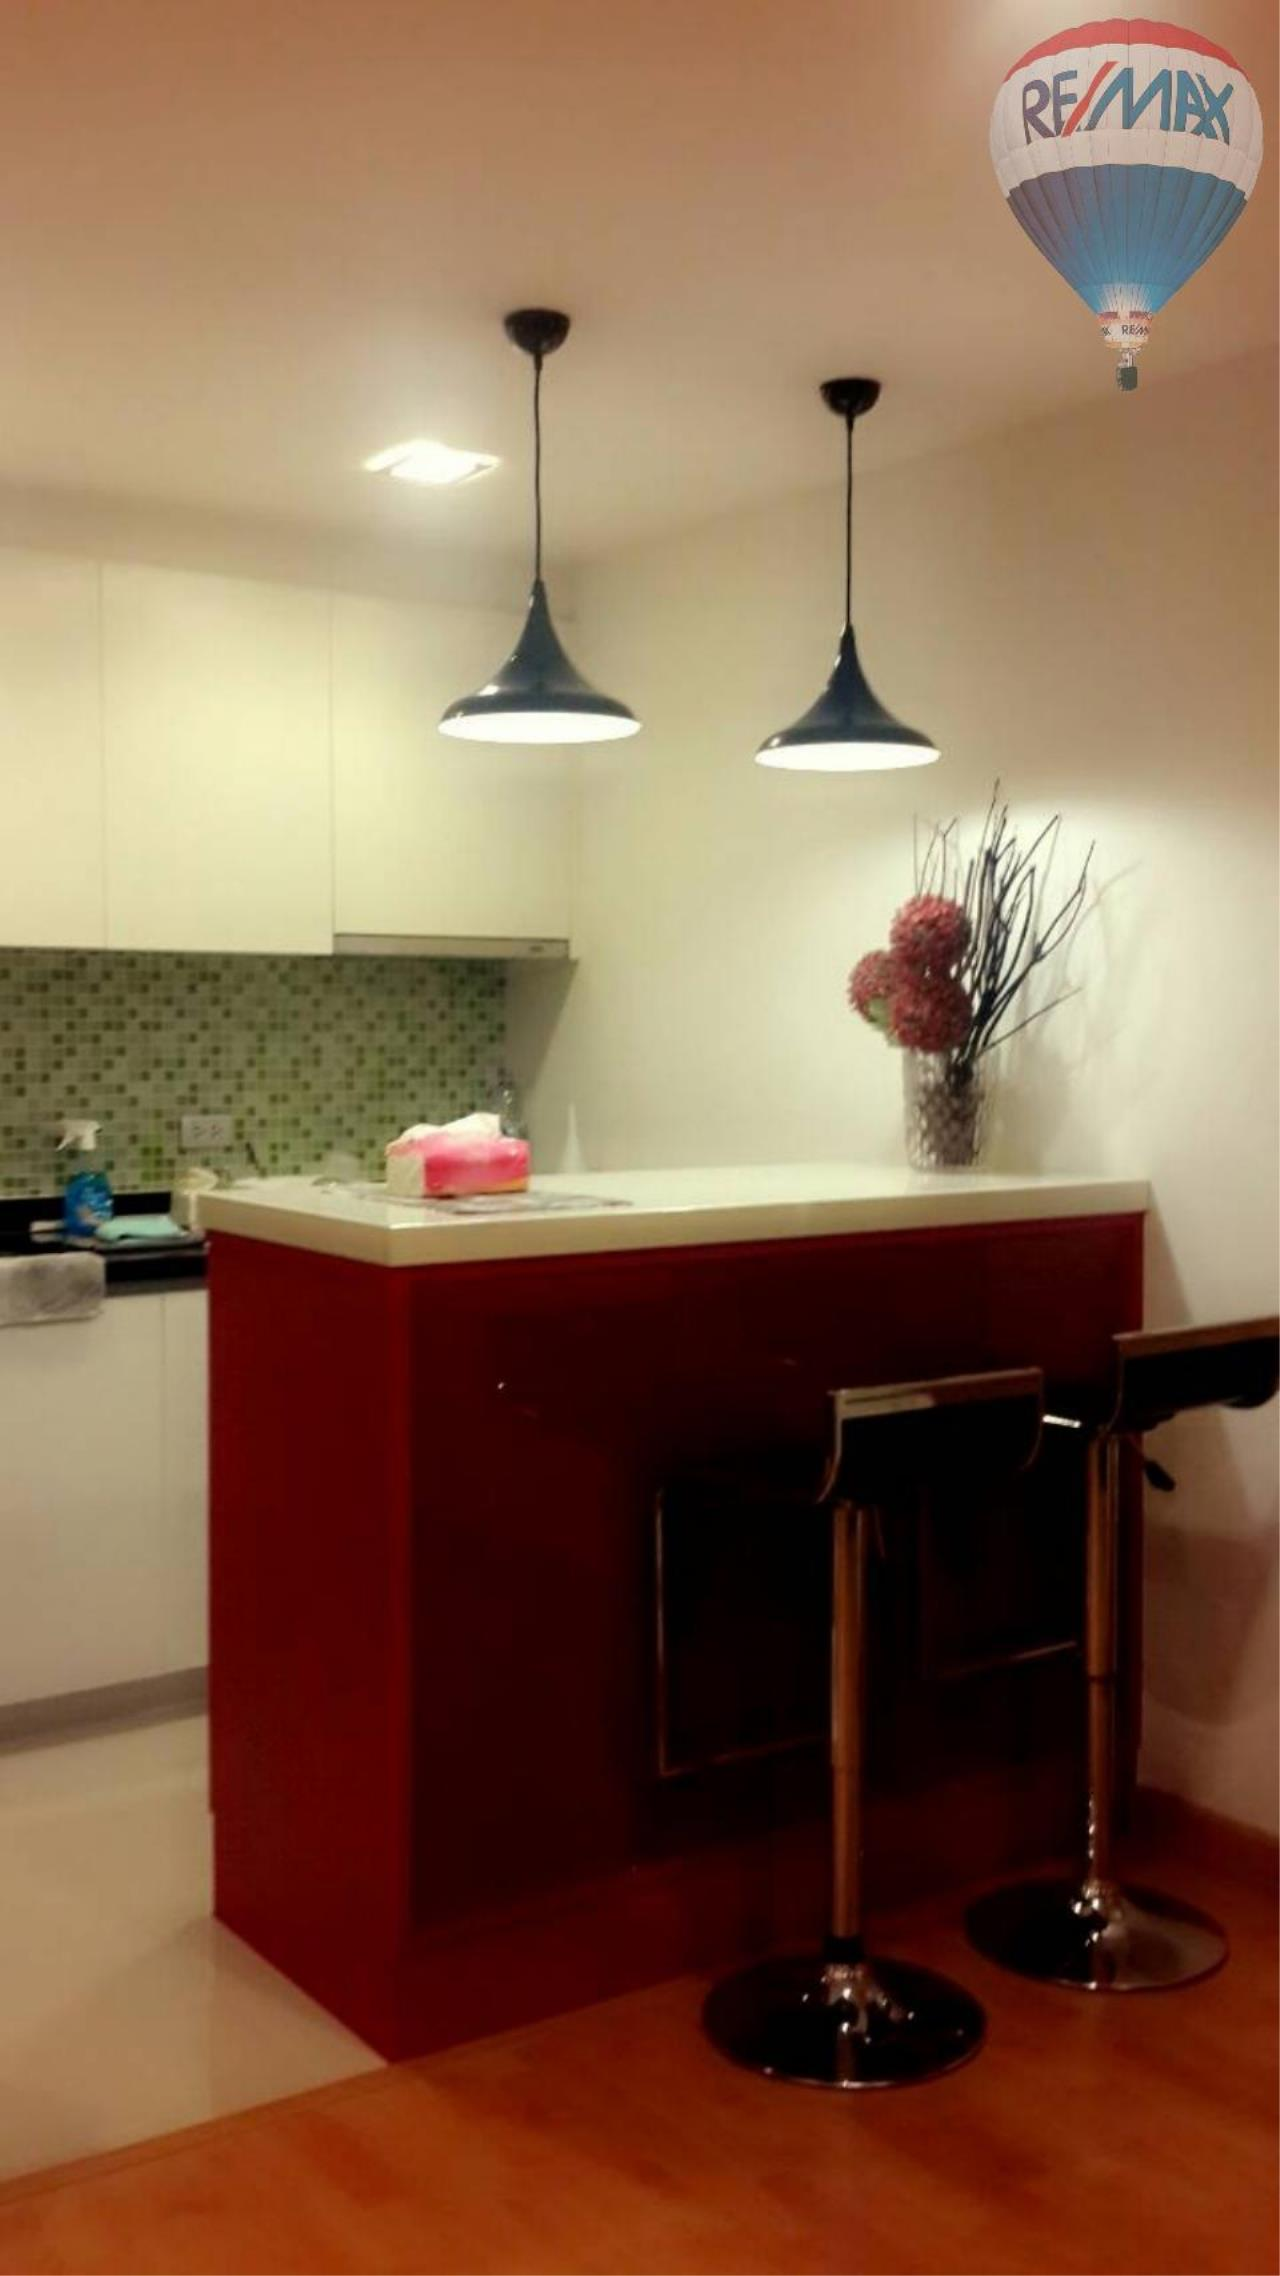 RE/MAX Properties Agency's 1 Bedroom 38 Sq.M. for renting in XVI Condominium 5